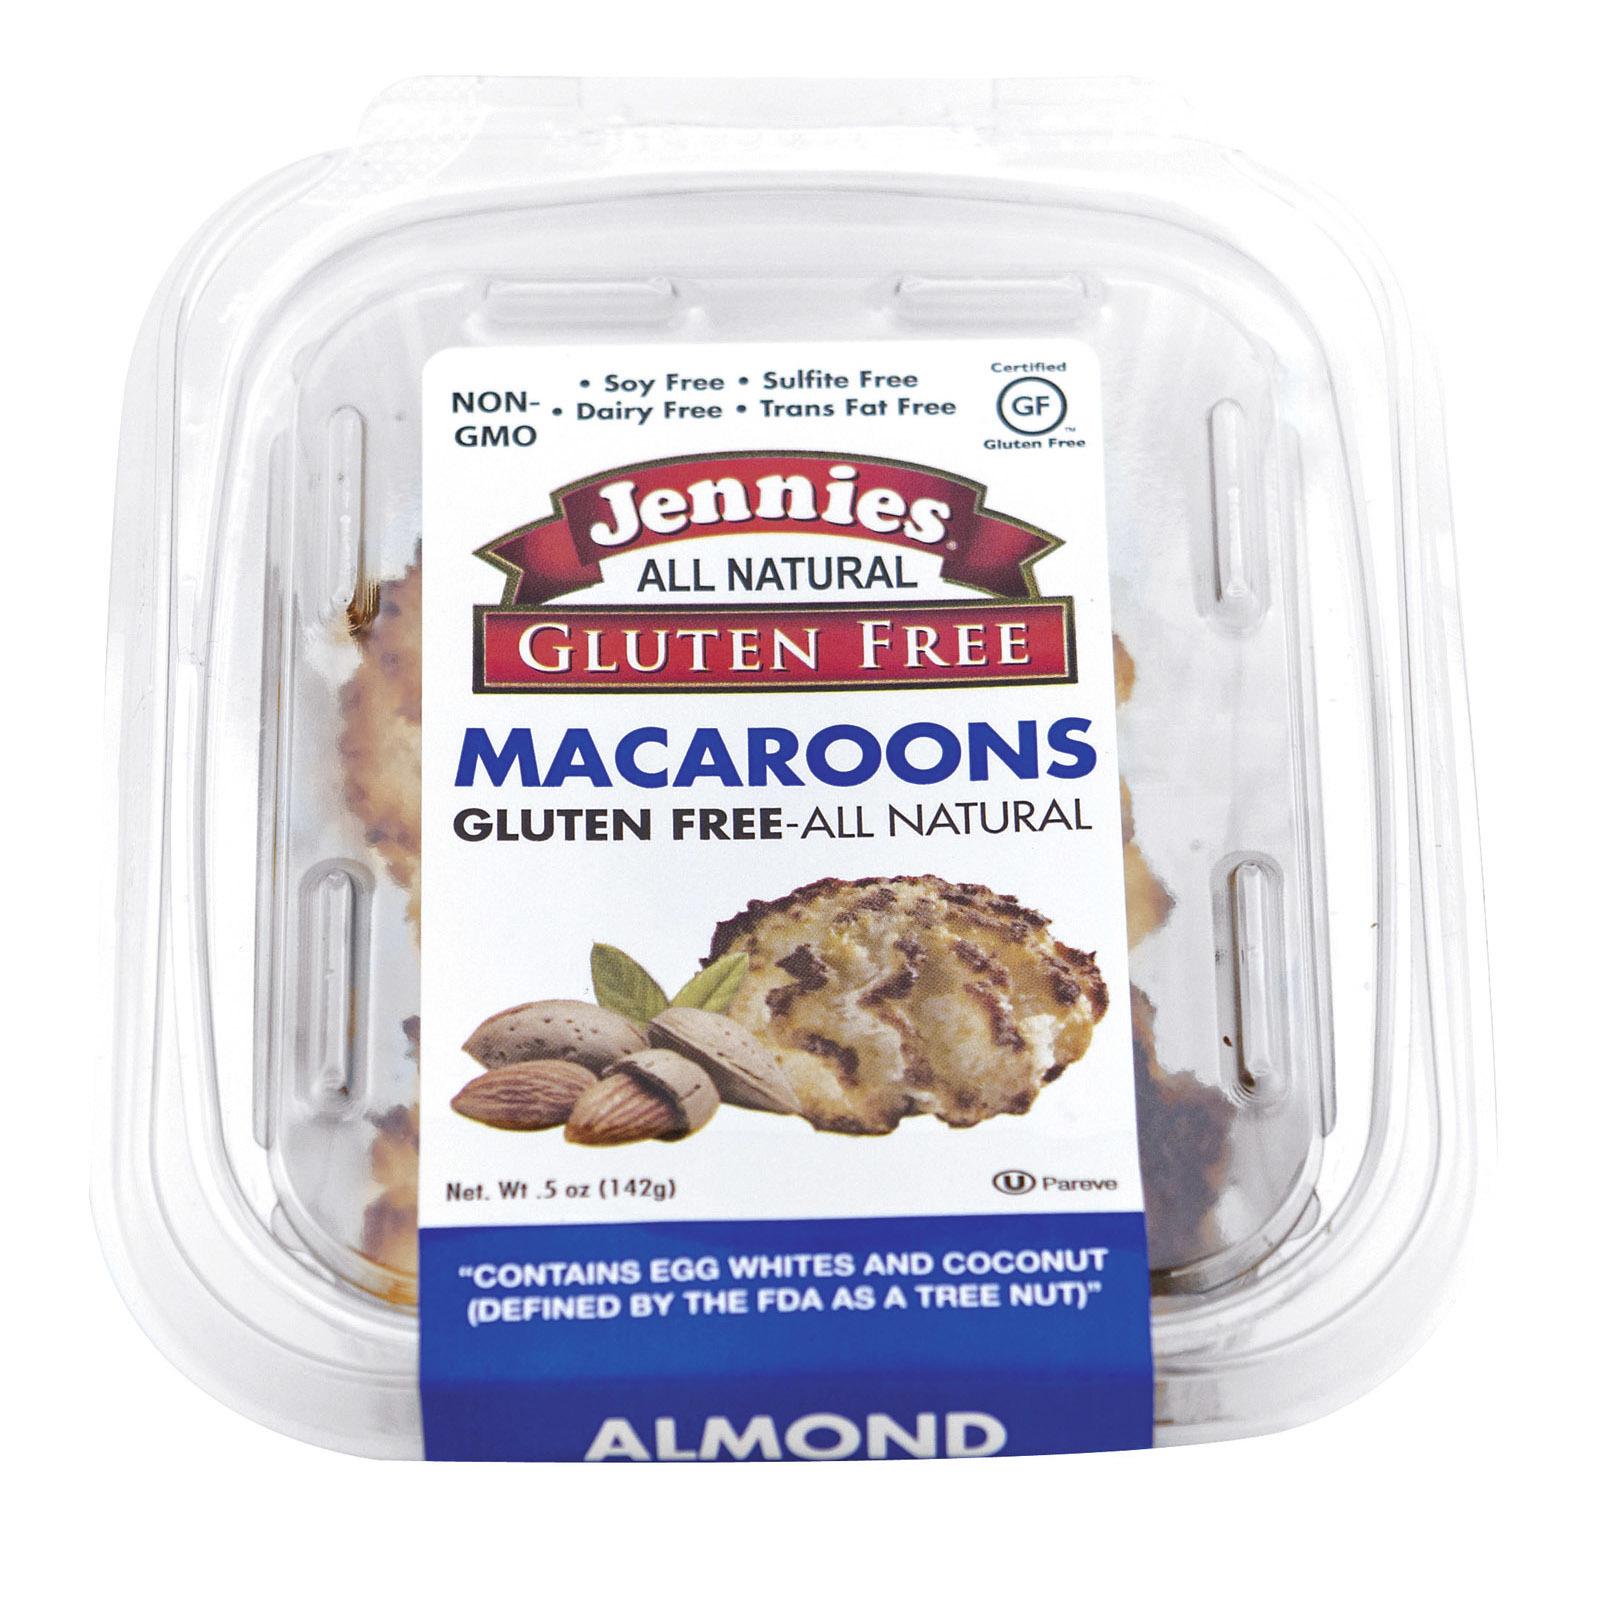 Jennie's Almond Mini Gluten - Almond - Case of 12 - 5 oz.